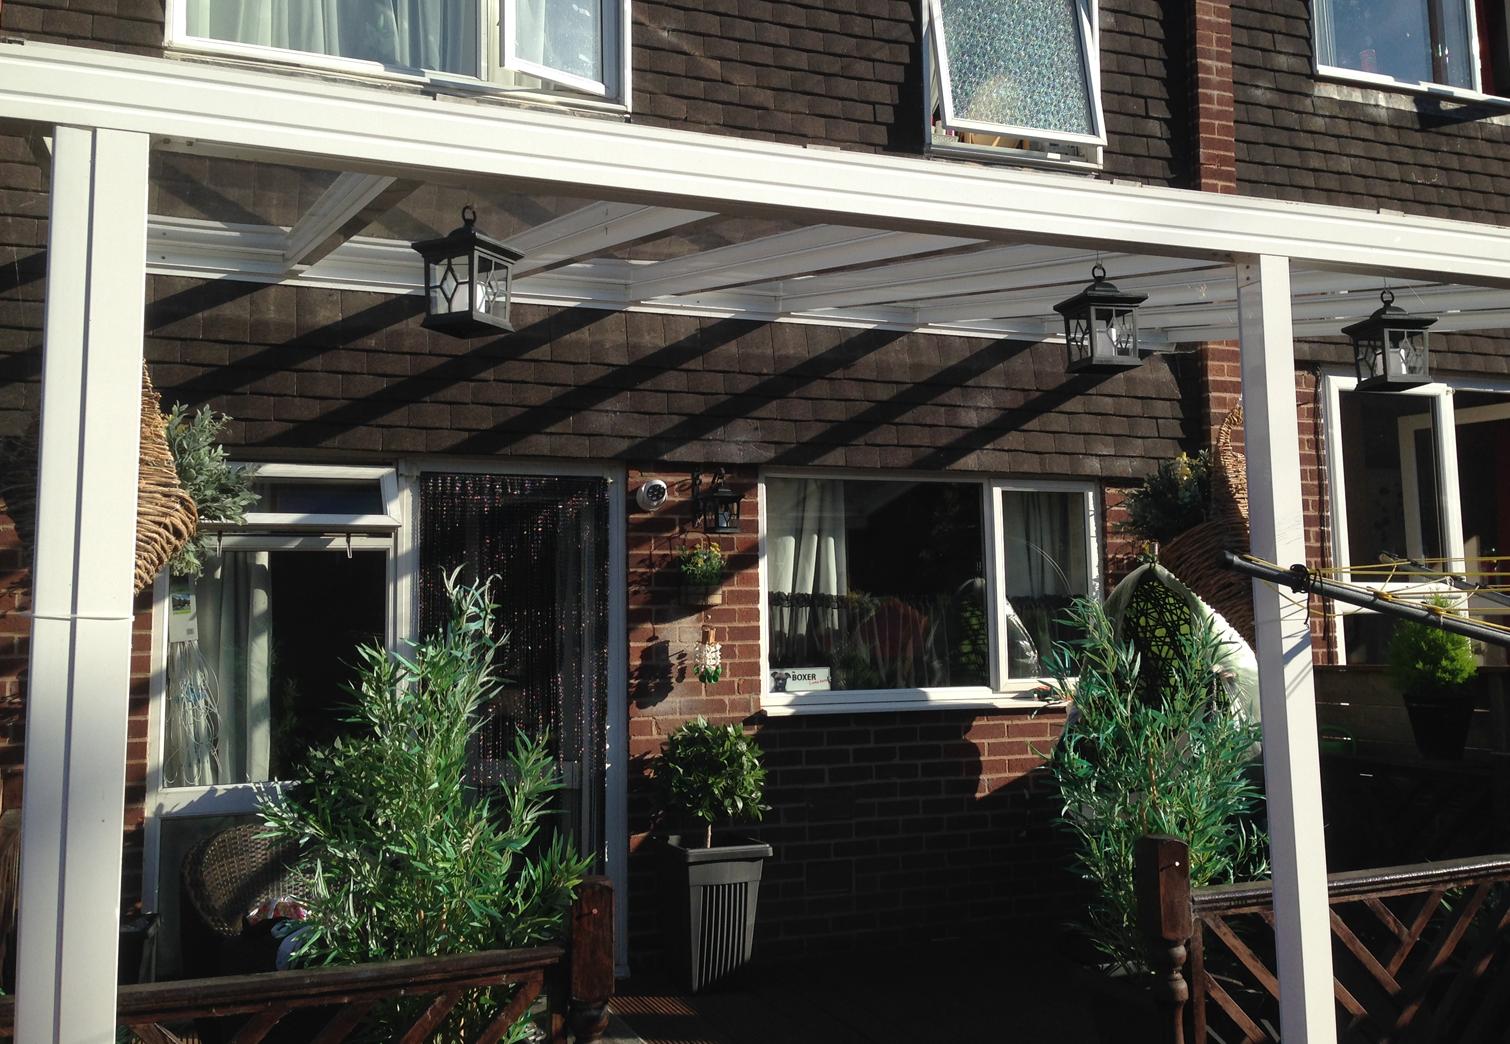 Easy to install Garden Canopy